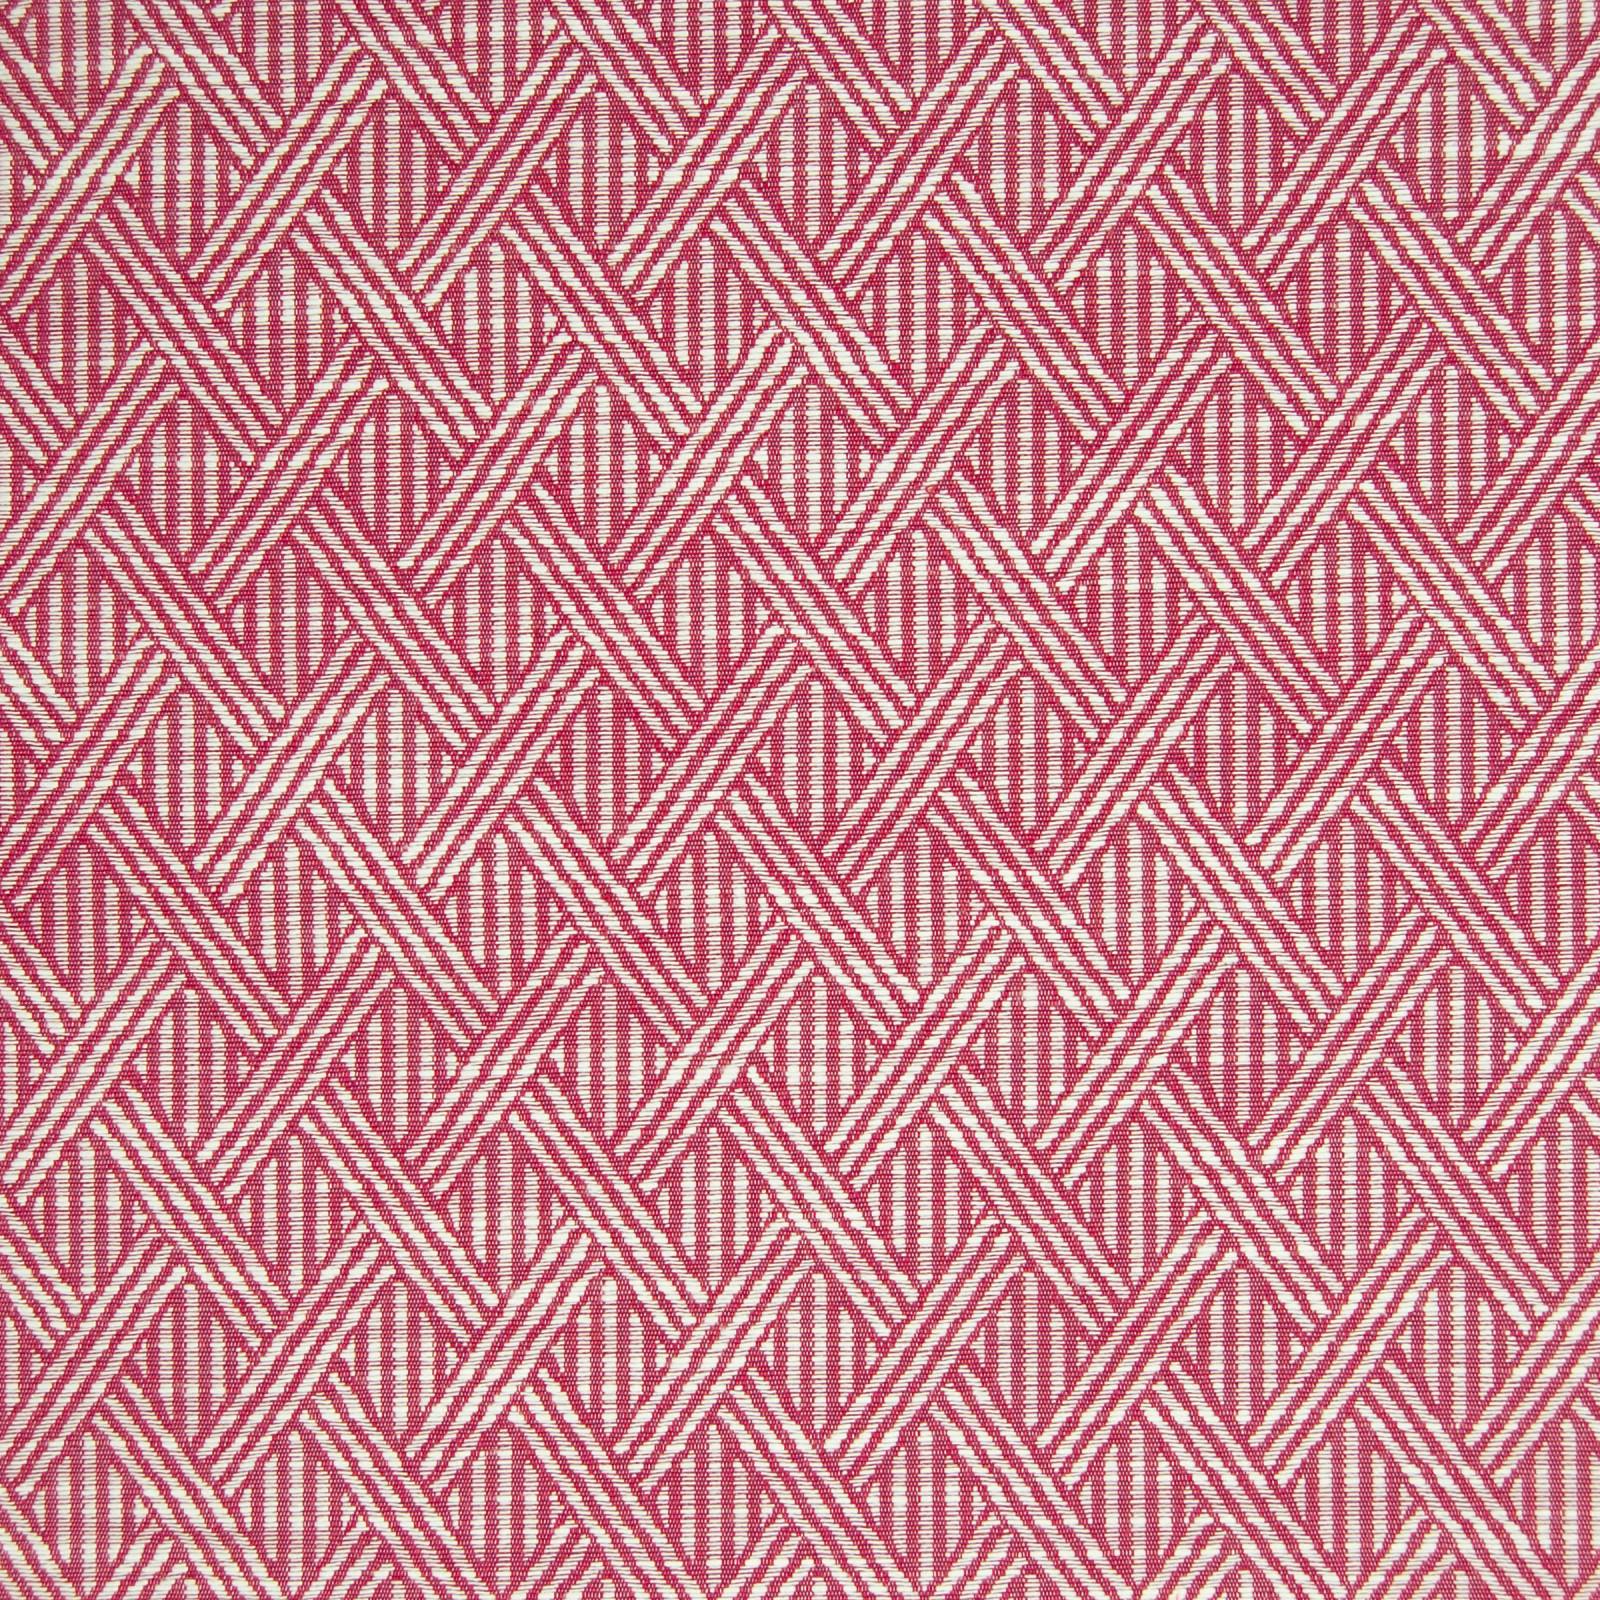 B7036 Cranberry Greenhouse Fabrics